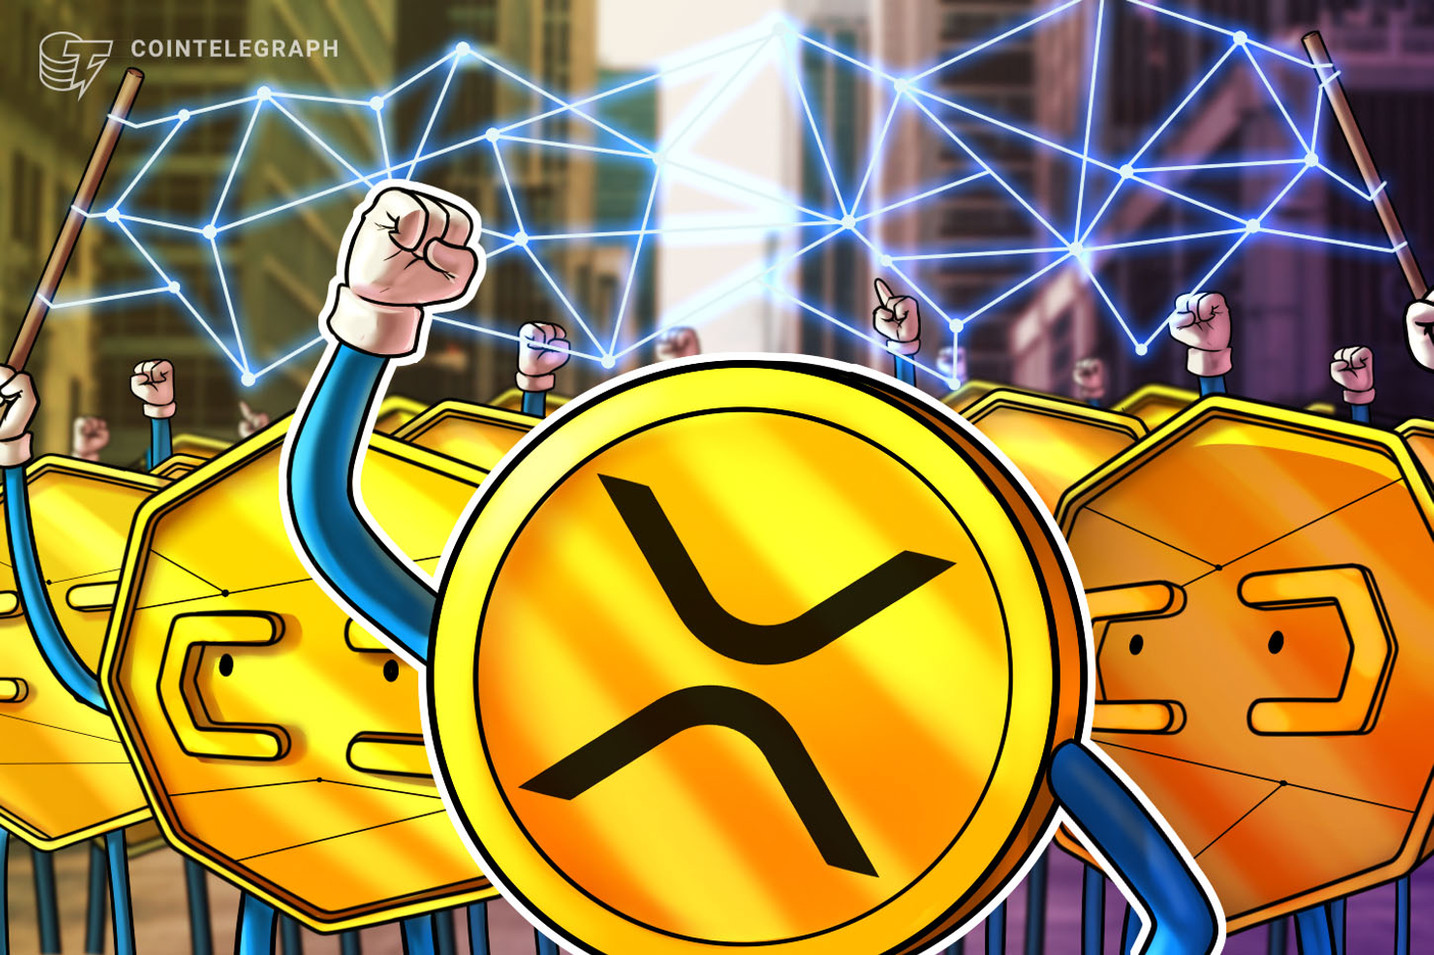 XRPを基軸とする仮想通貨取引所ビットゥルー、新たに27ペアを追加へ【ニュース】